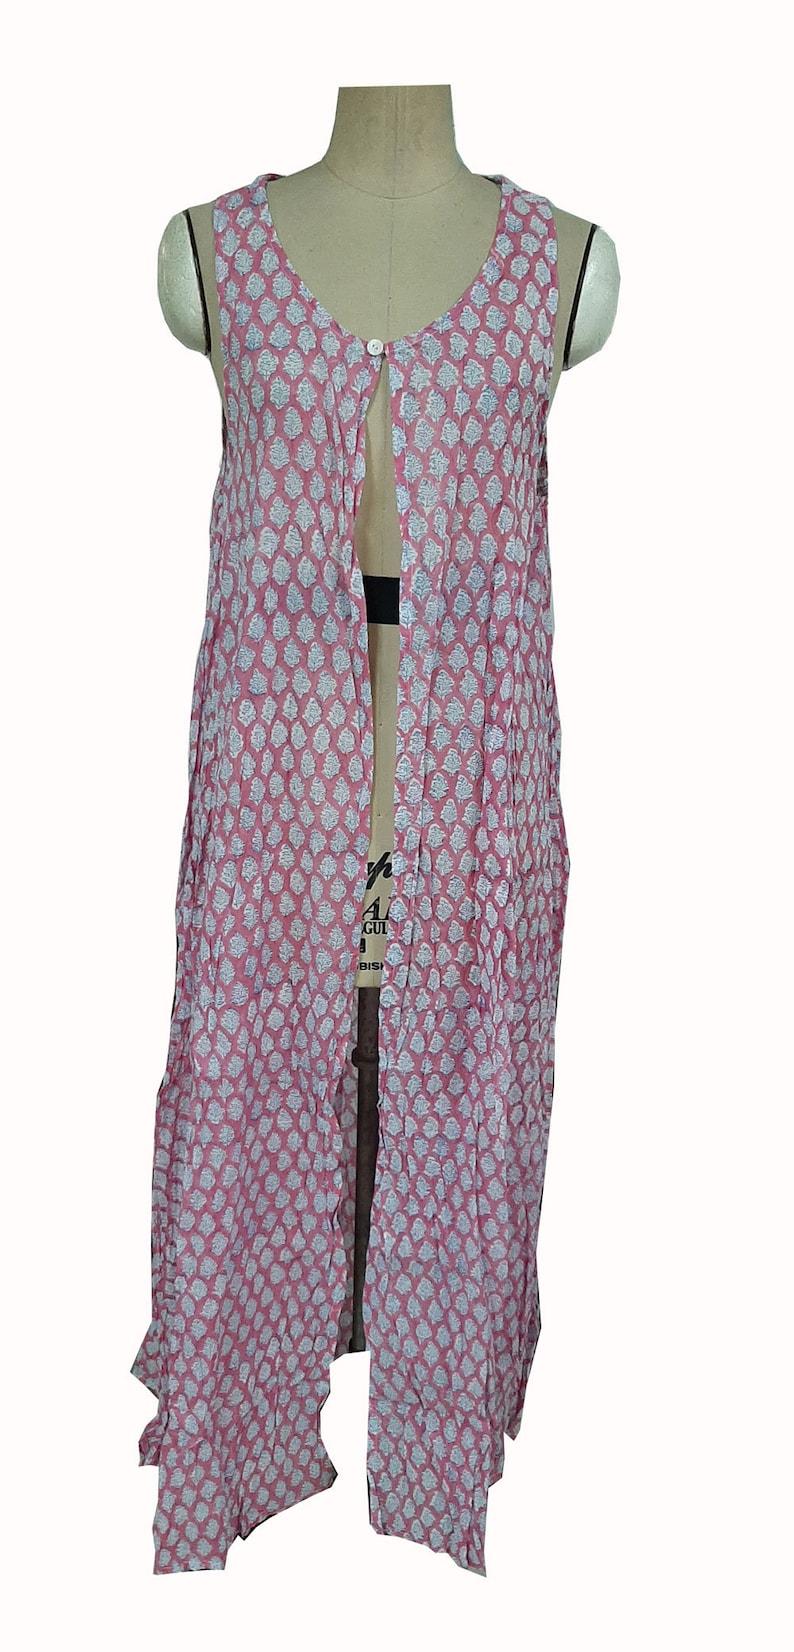 Dressing Gown kaftan dress 100/% Cotton dress Bridesmaid Gifts Cotton Kimono Robes Beach Cover ups kimono dress Block print kimono